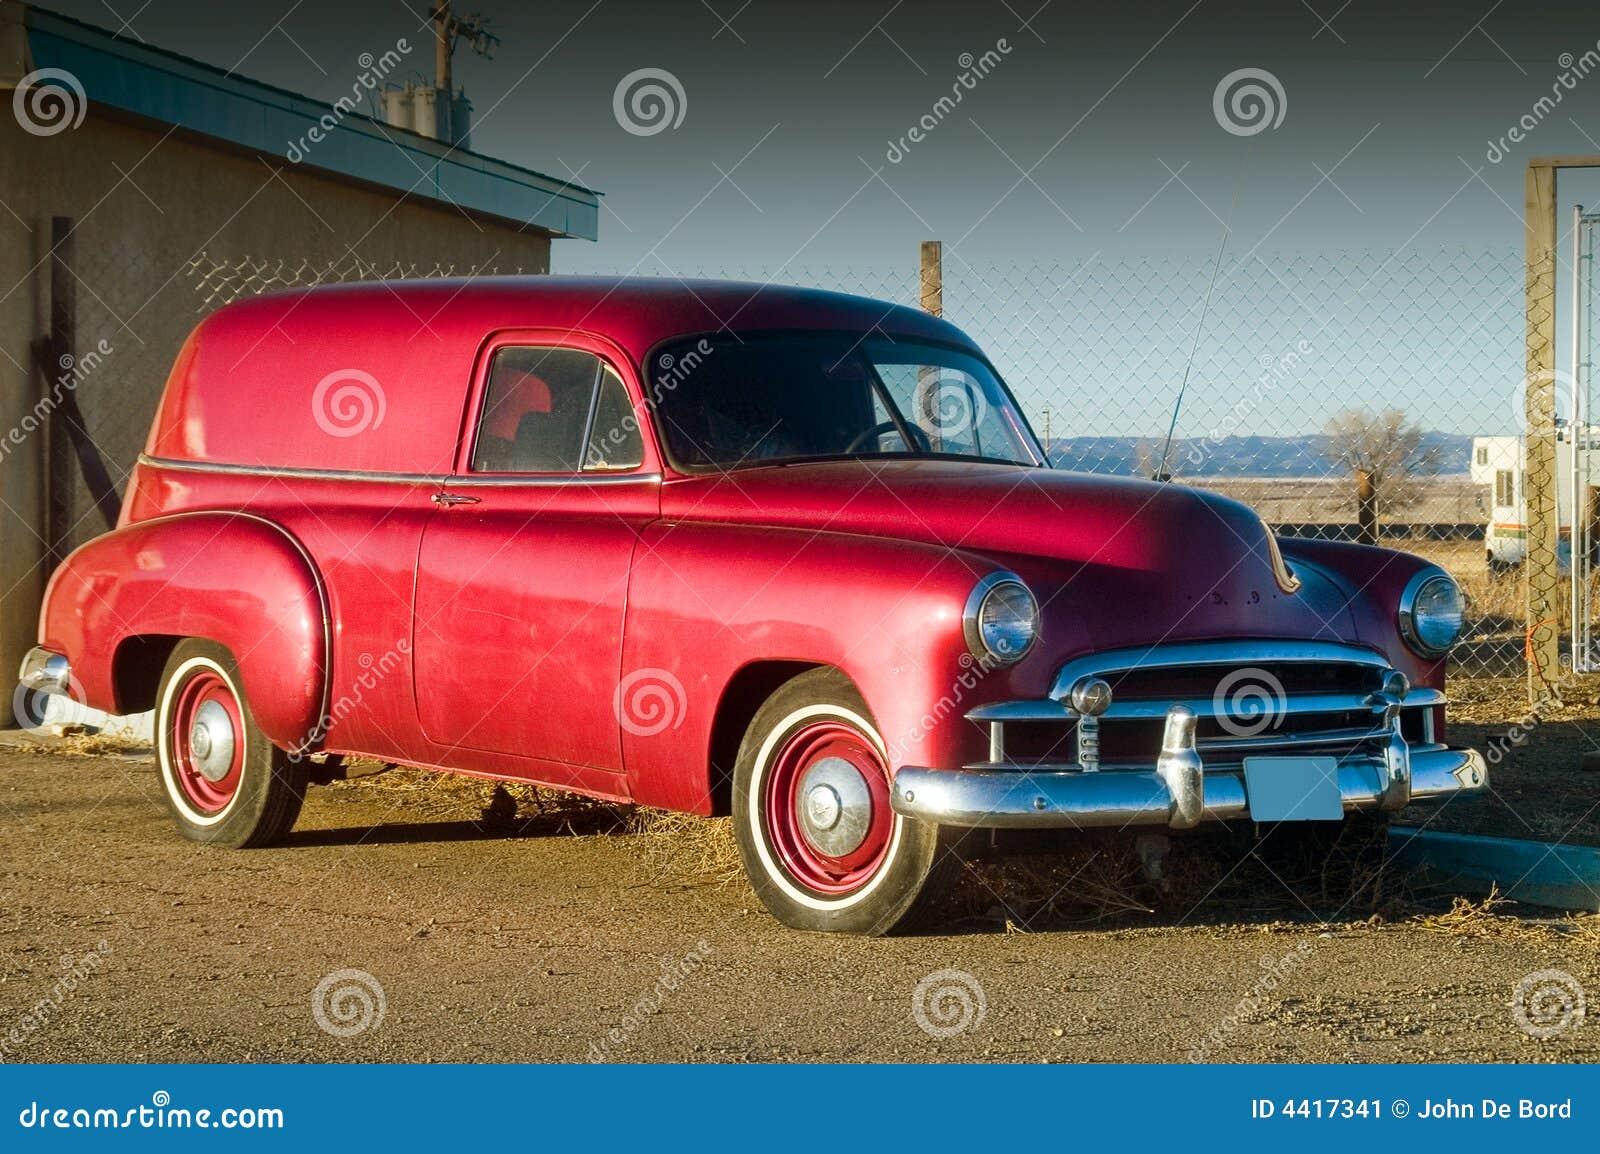 S Red Hotrod Panel Car